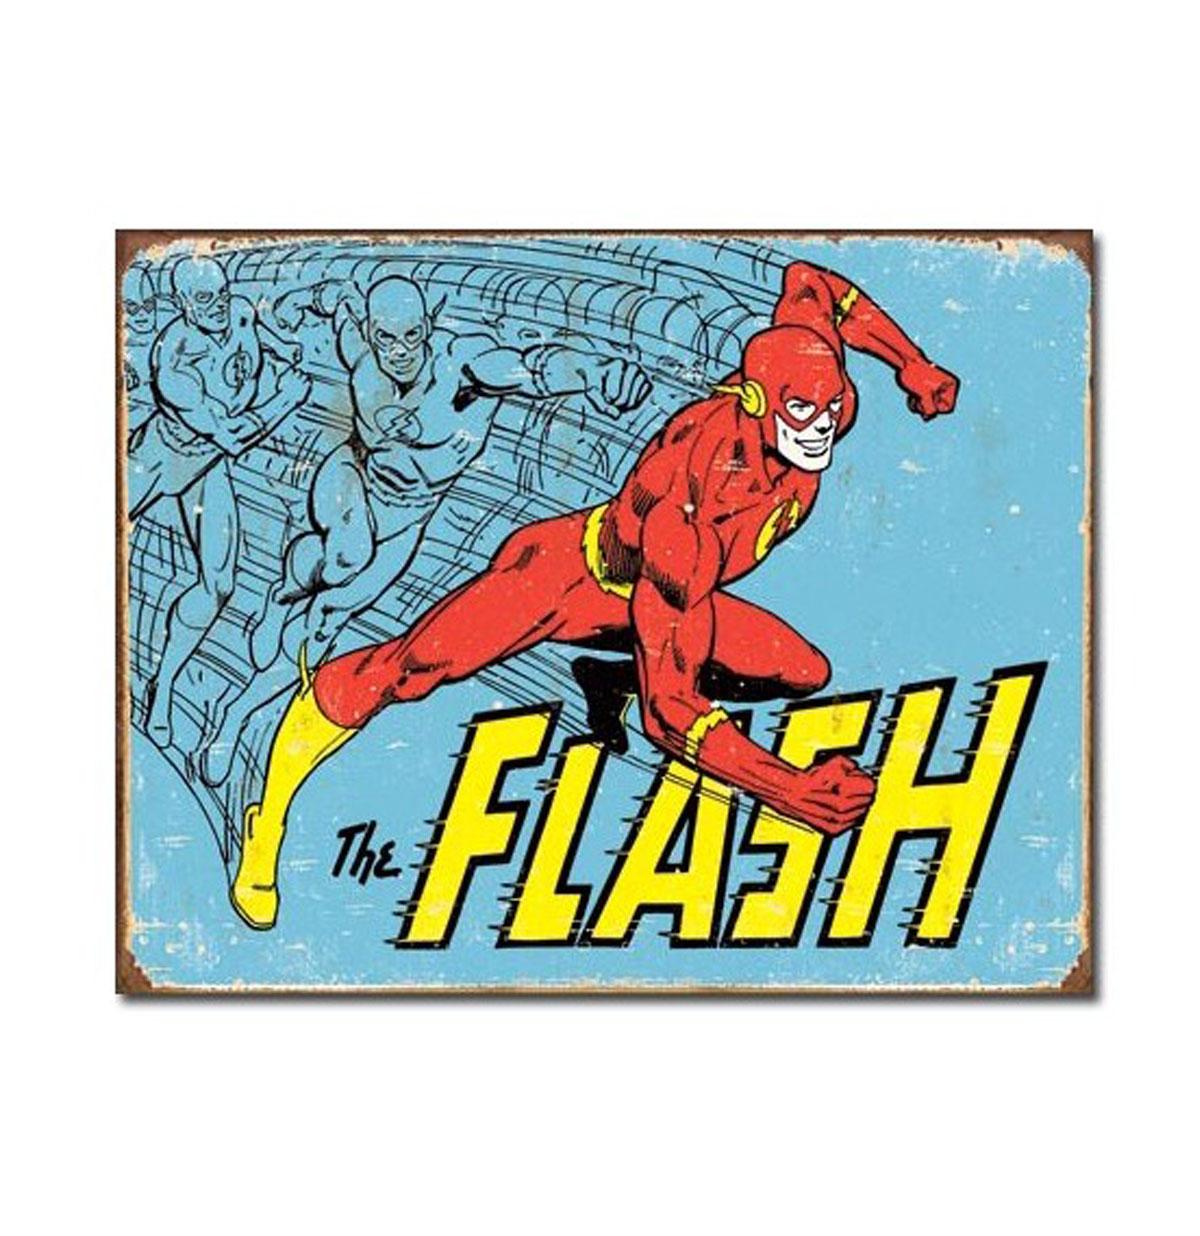 Flash Gordon The Flash Metal Print - Poster